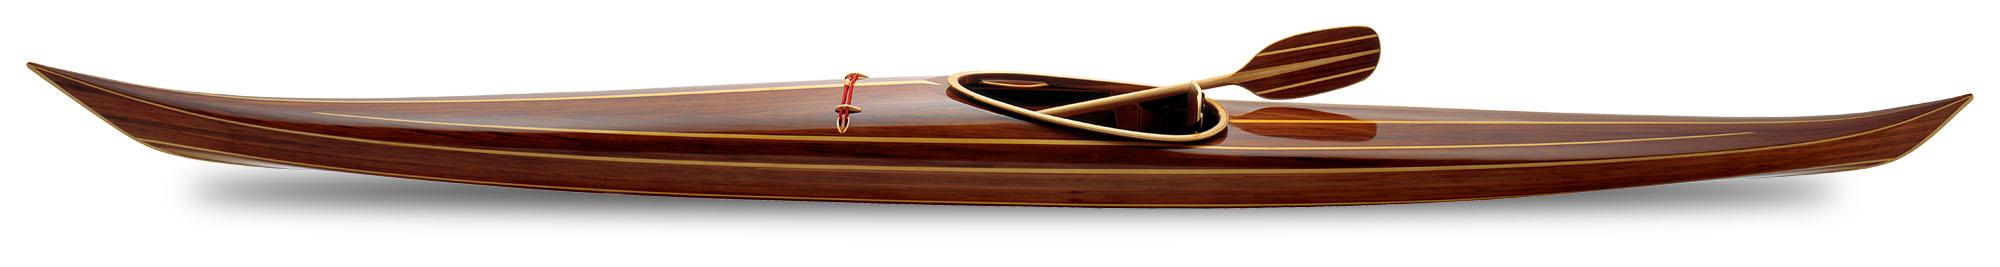 Night Heron Cedar Wood Kayak at MoMA